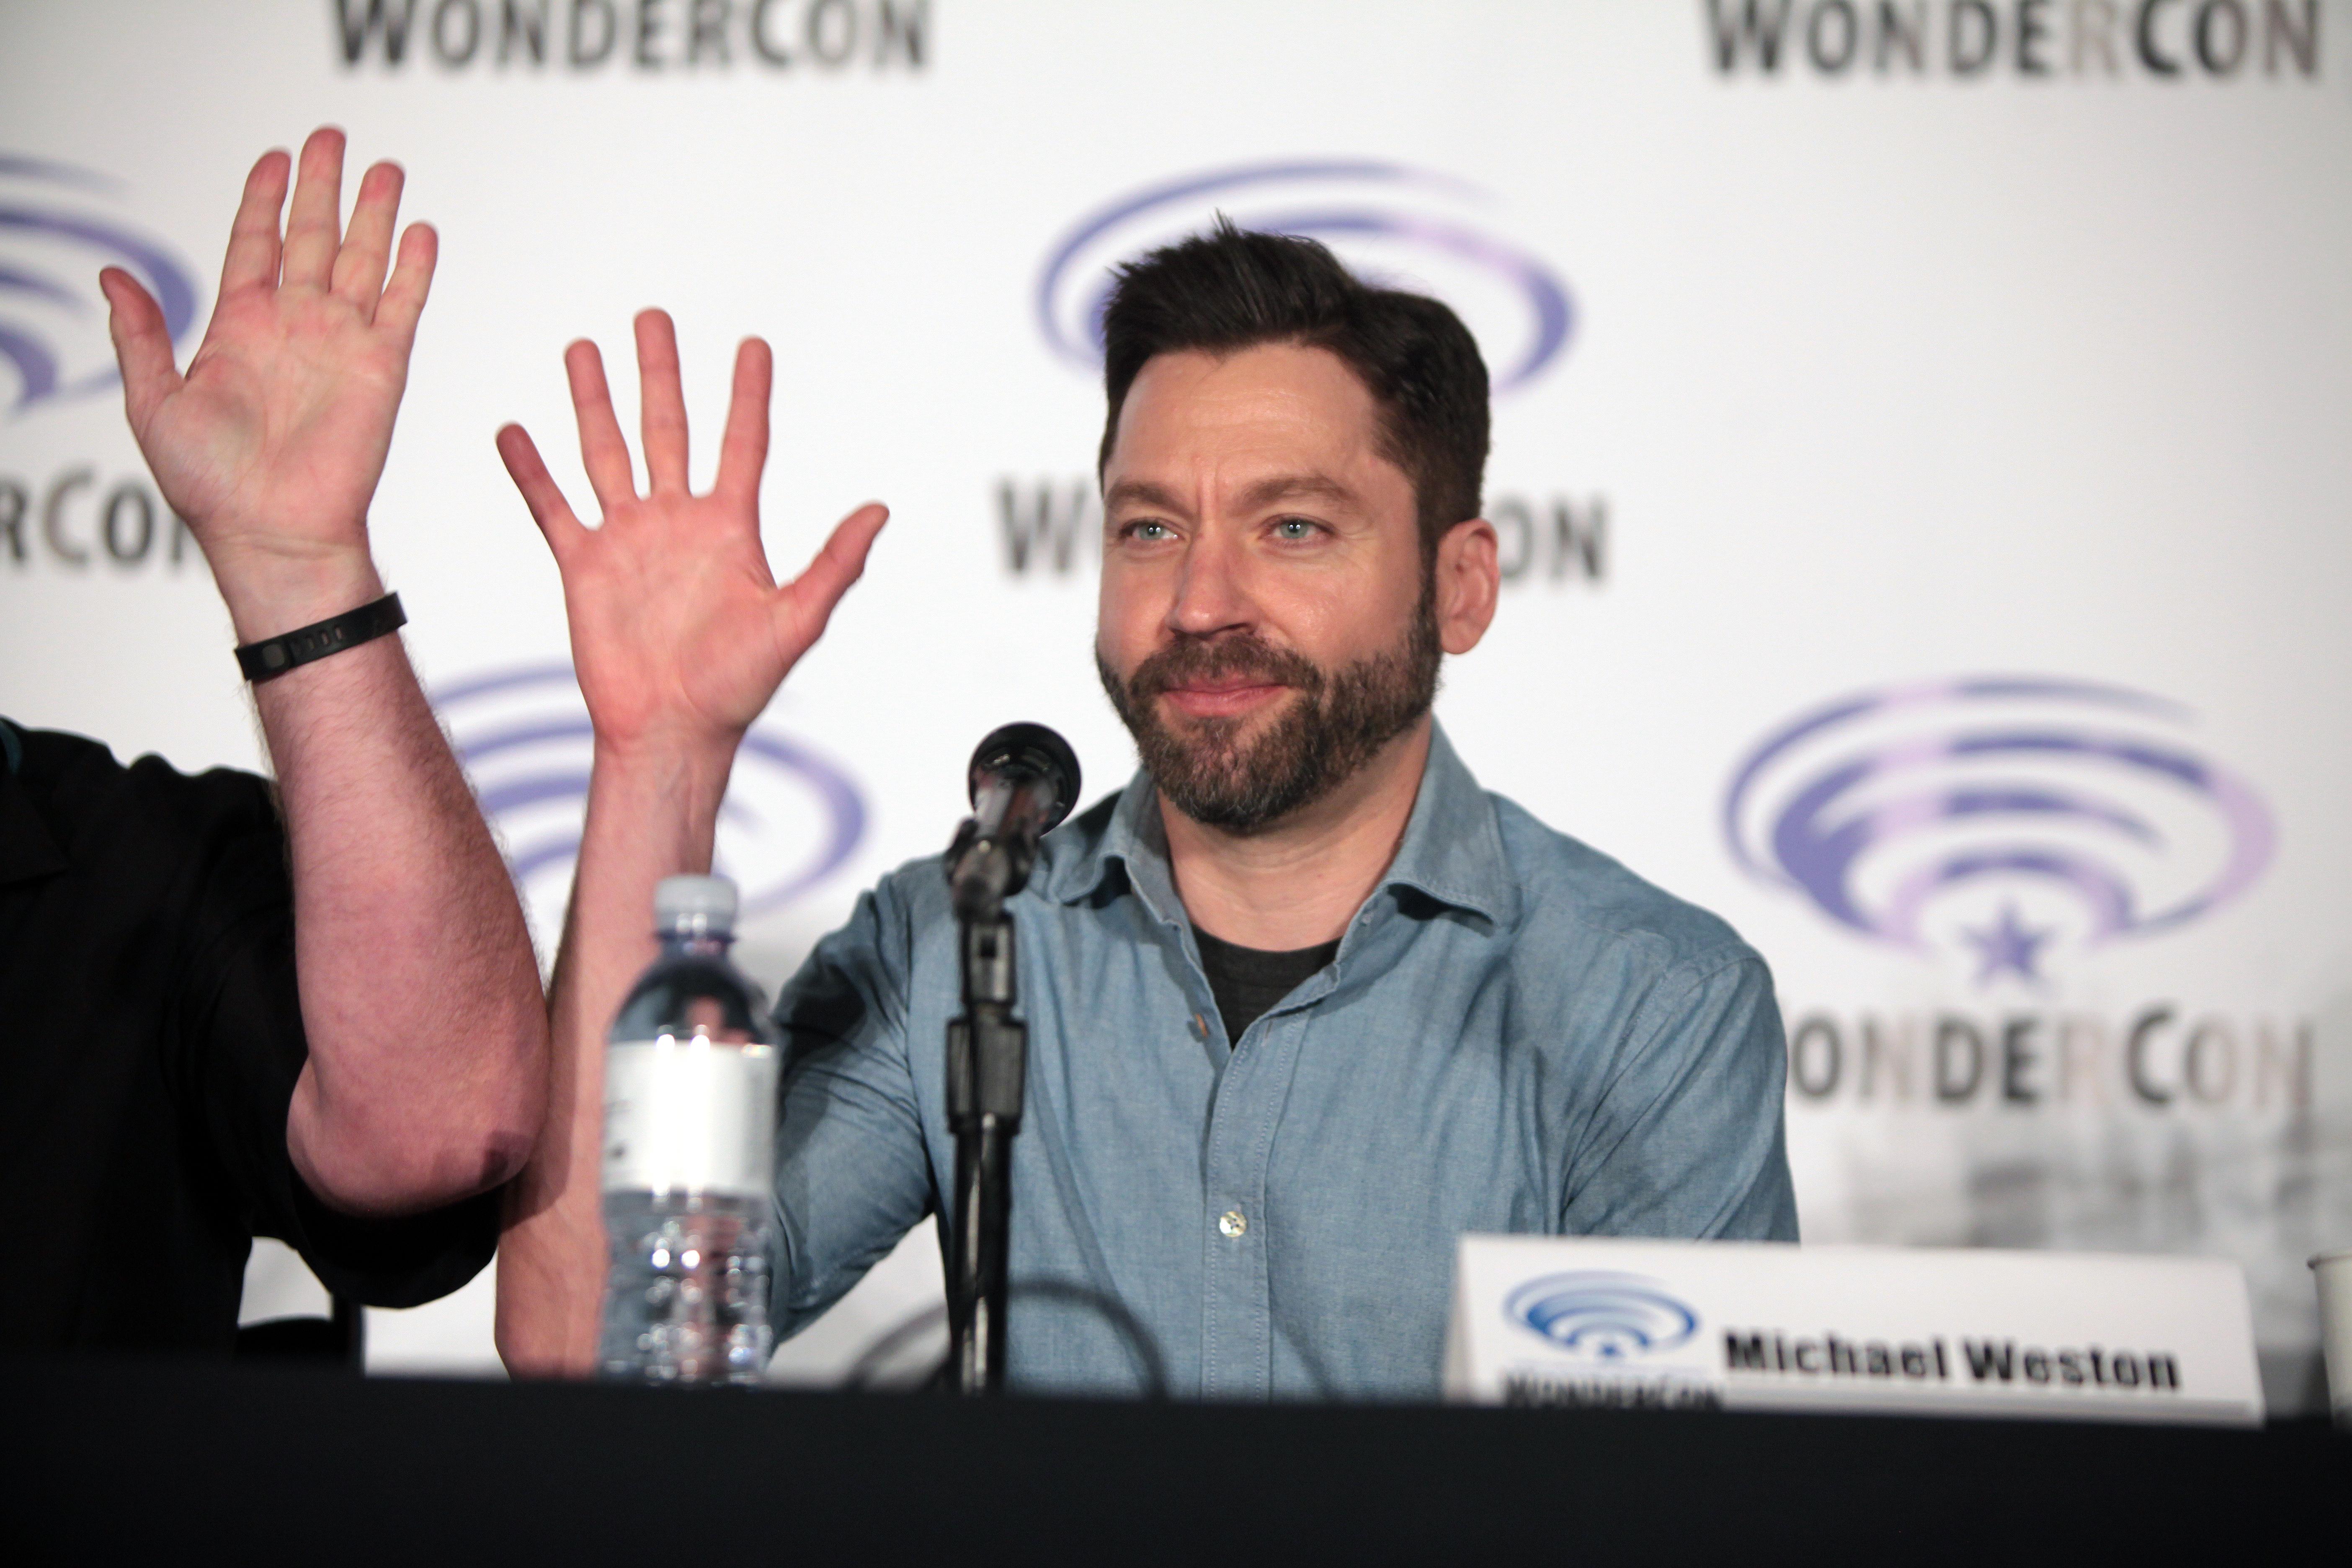 File:WonderCon 2016 - Houdini and Doyle panel - Michael